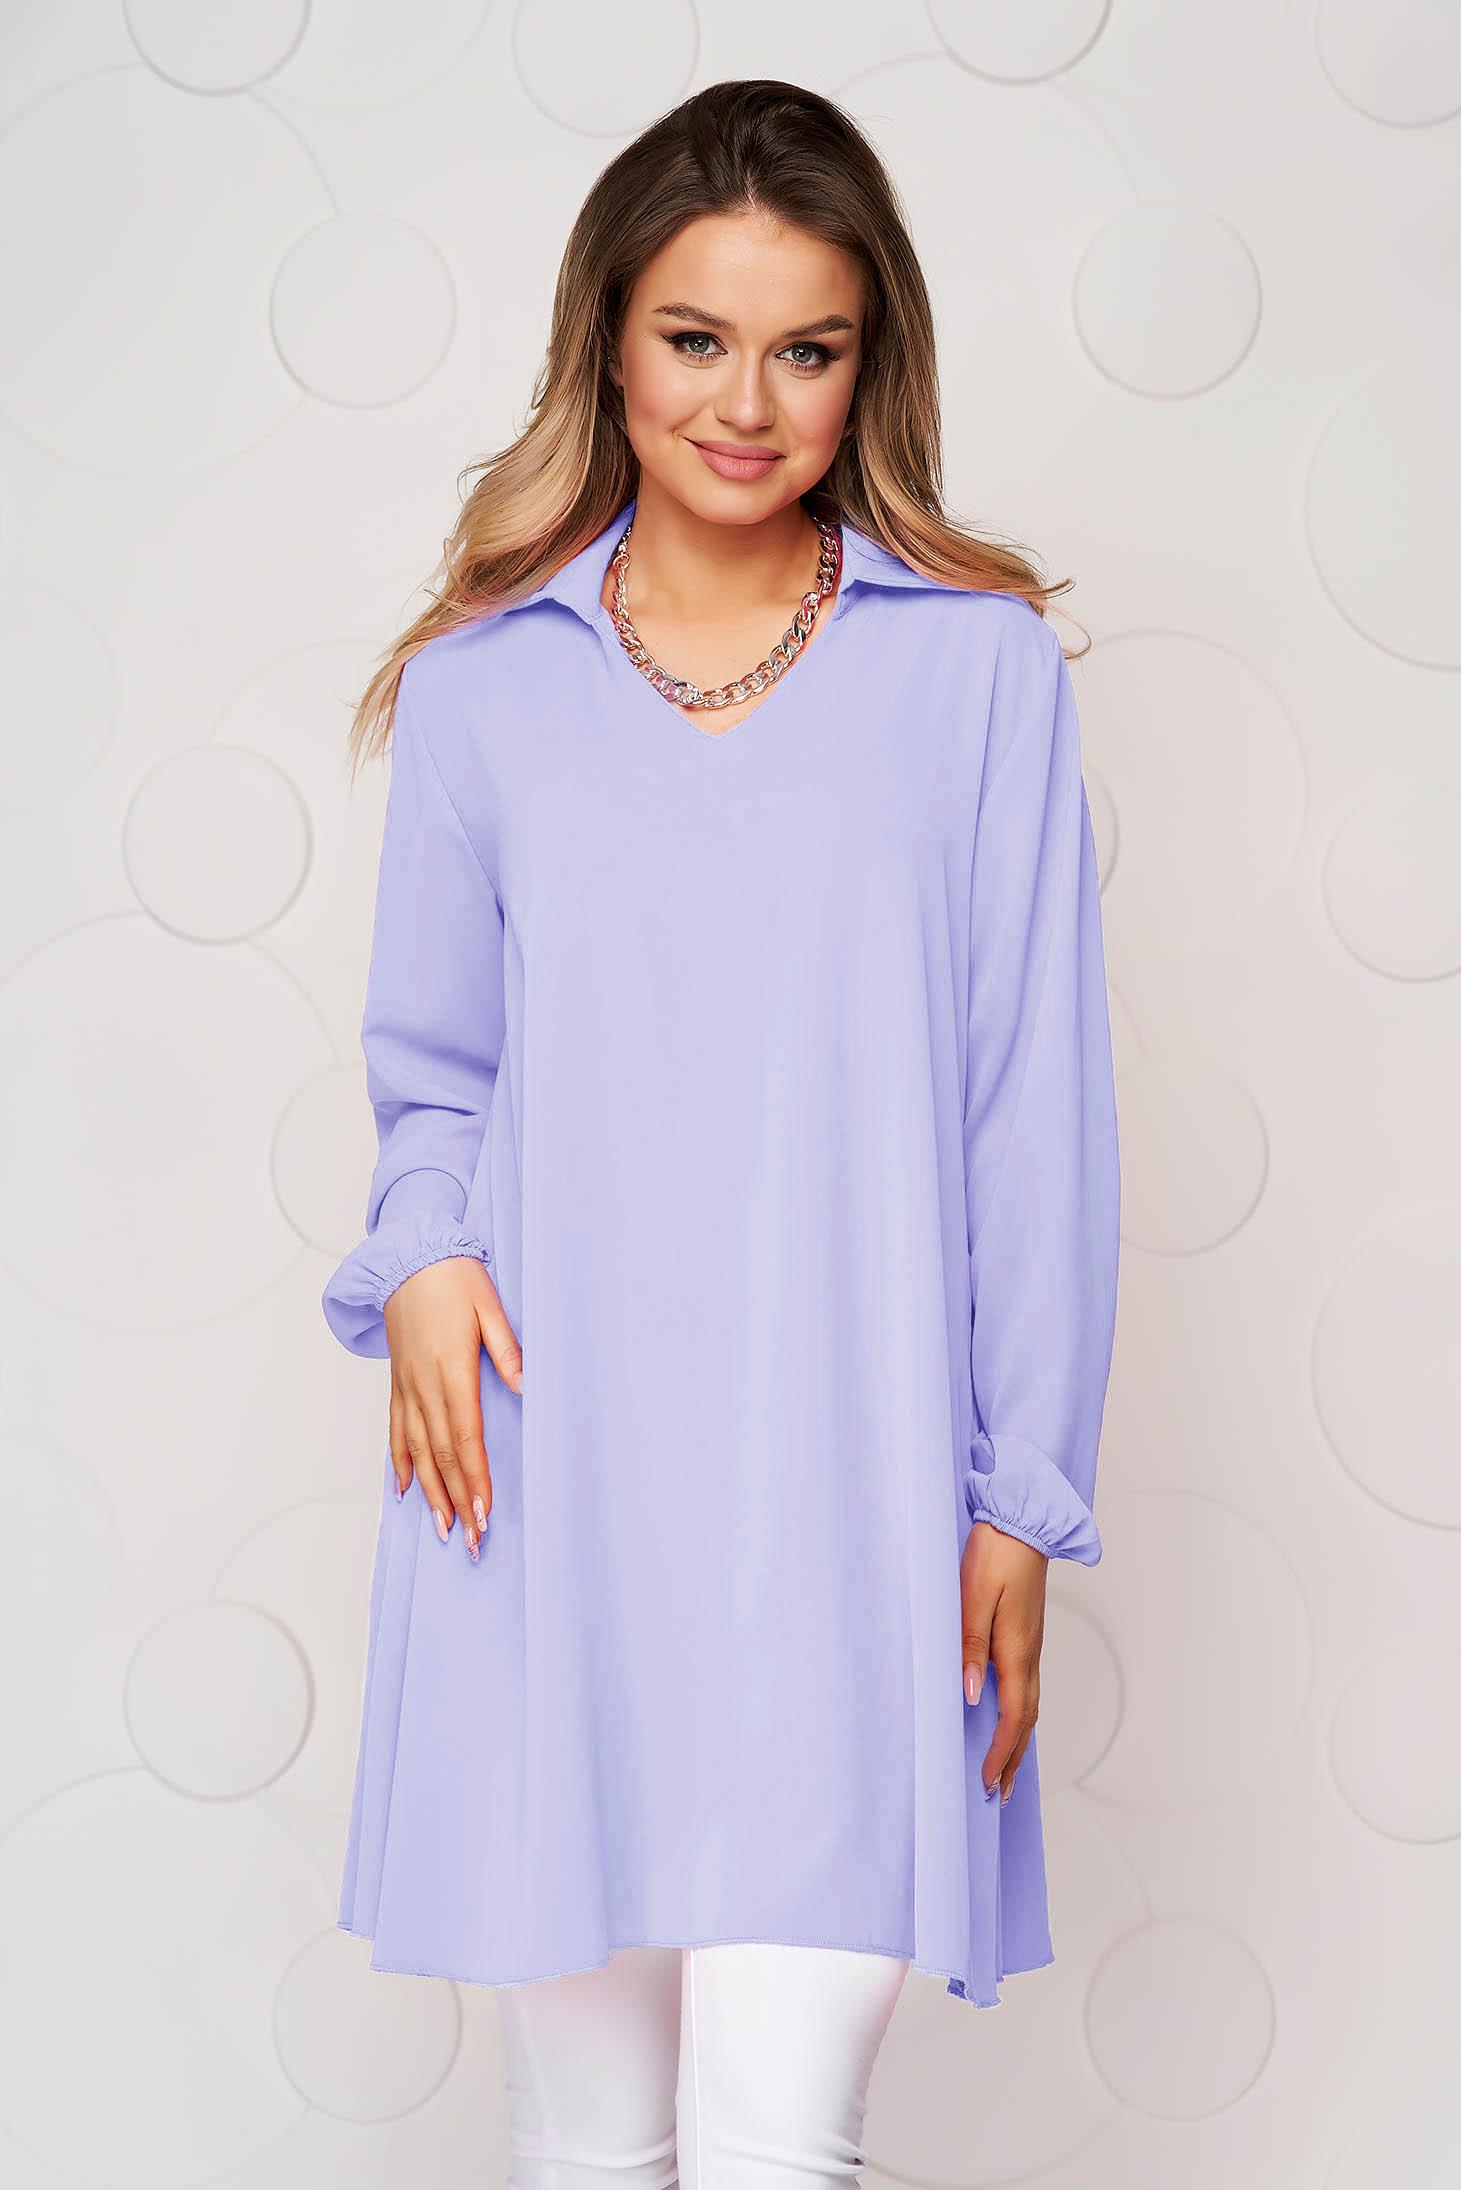 Lila women`s blouse loose fit transparent chiffon fabric long sleeve